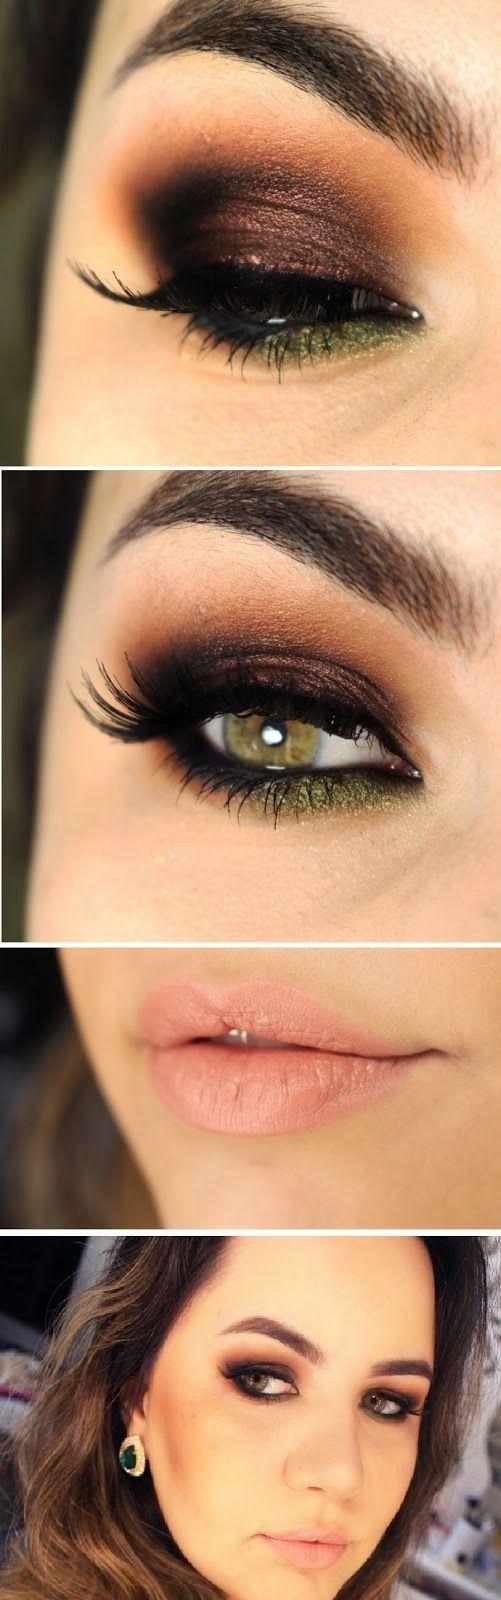 Gorgeous Eyes Makeup Inspires Scar # Inspiration / Best LoLus Makeup Fashion